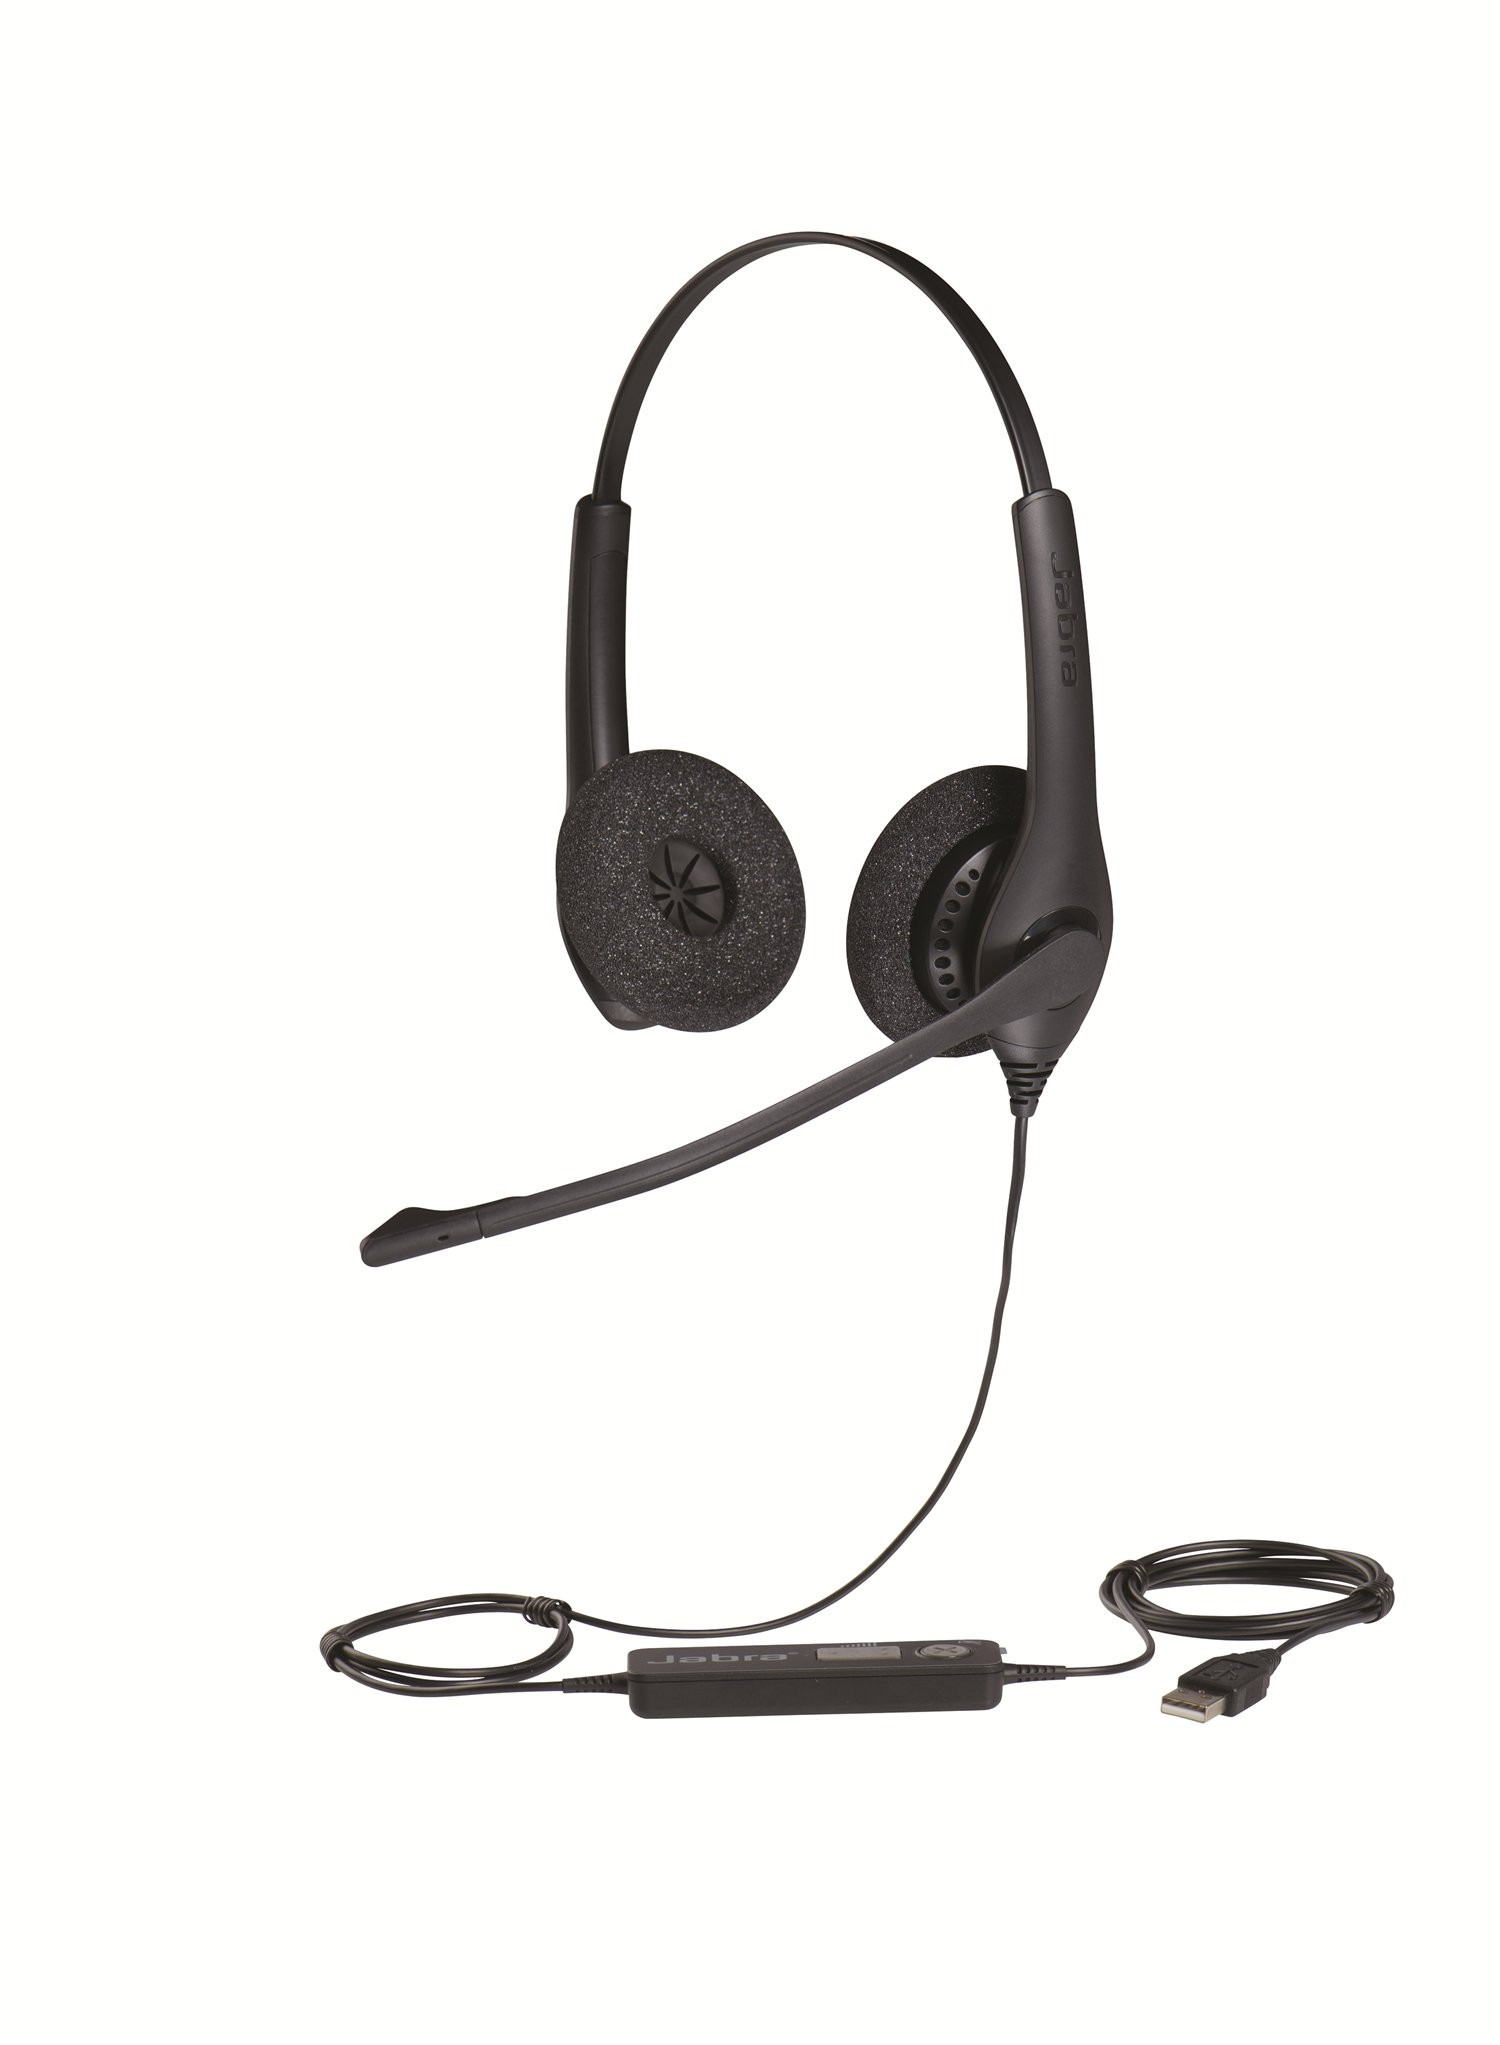 Jabra Biz 1500 USB Binaural Headset